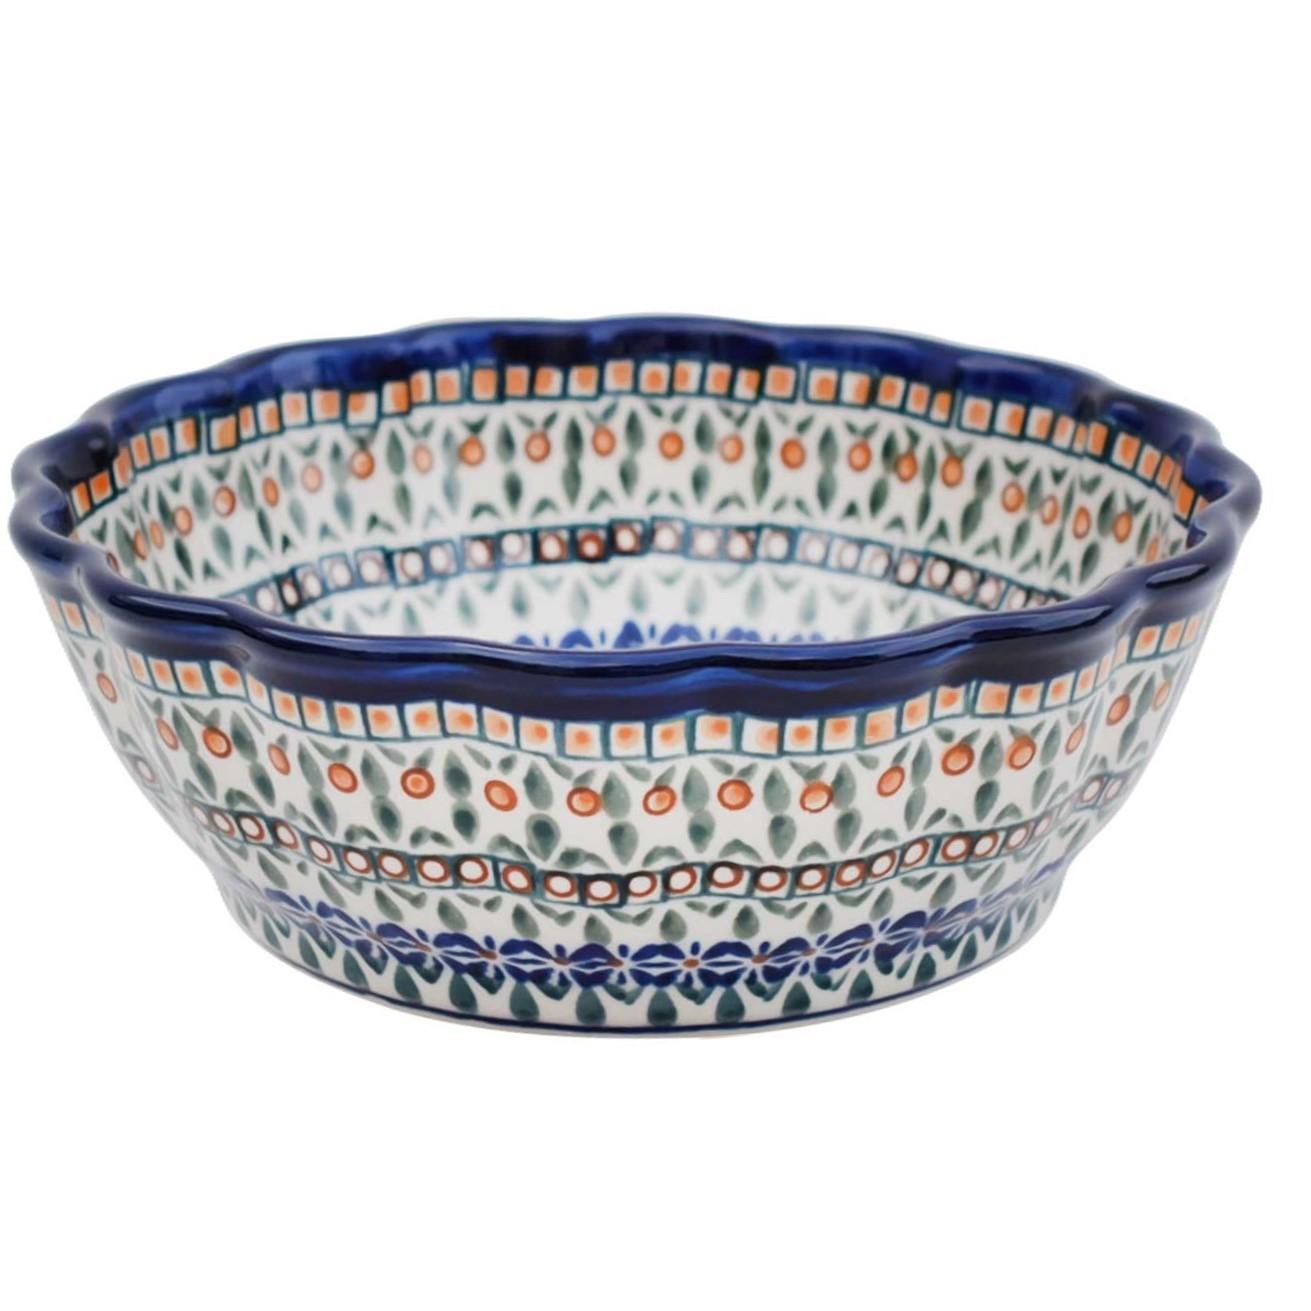 Pottery Avenue Scalloped Stoneware Serving Bowl - 1278-DU199 Enchanting